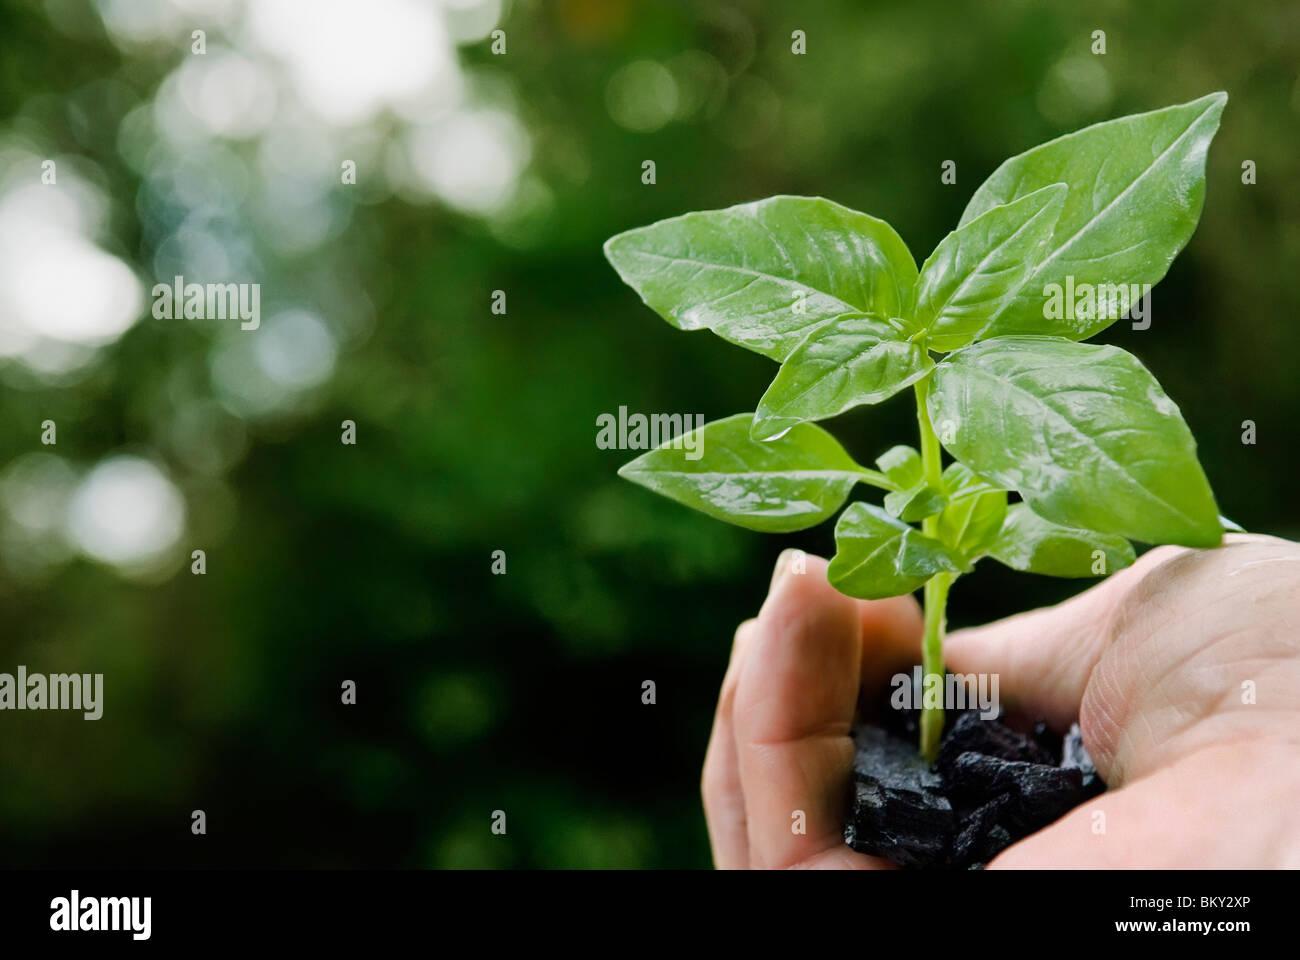 Basil plant in hand full of coal - Stock Image